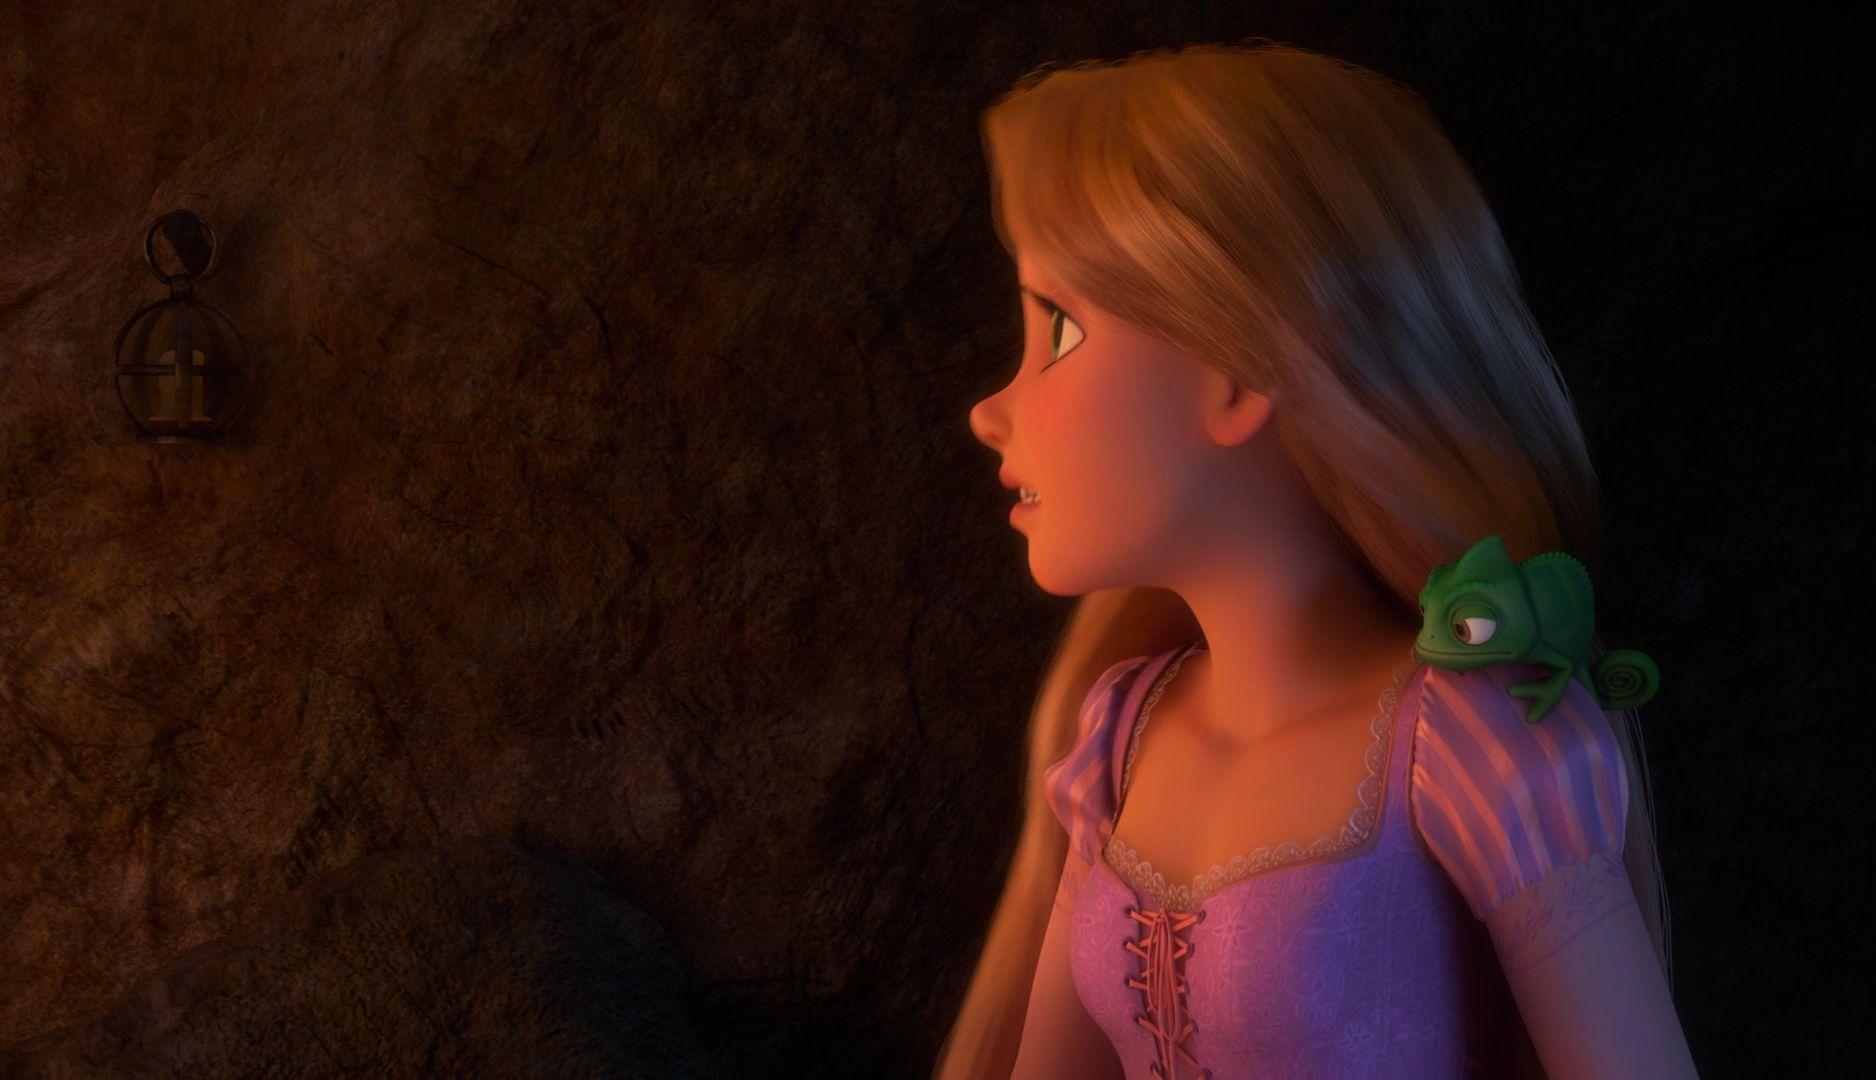 Tangled: Full Movie [Screencaps] - Tangled Image (21735016 ... Disney Rapunzel Screencaps